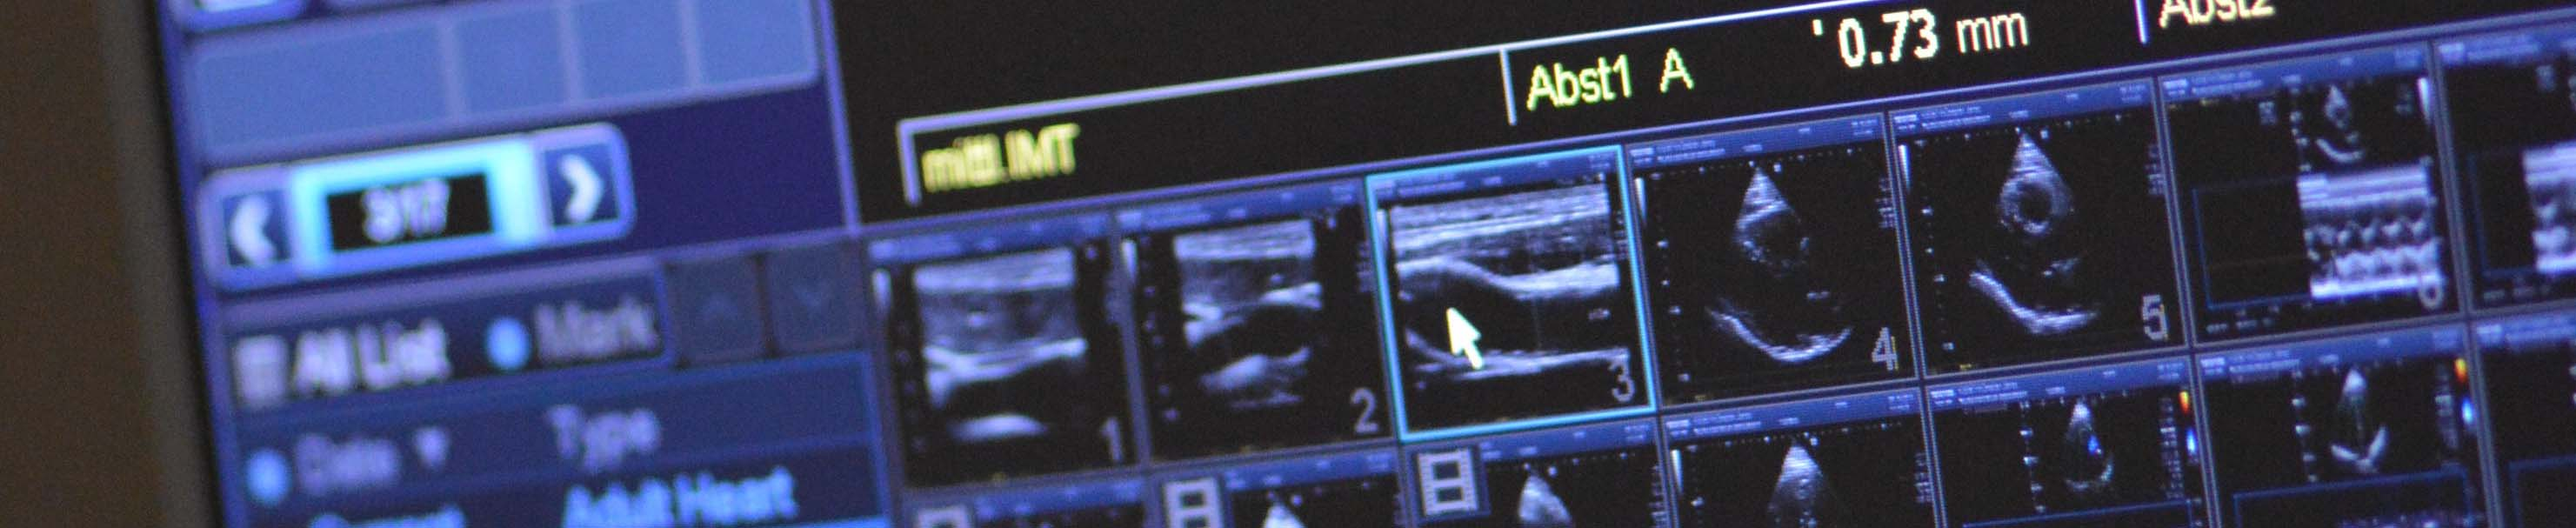 kardiologie-slideshow4.jpg